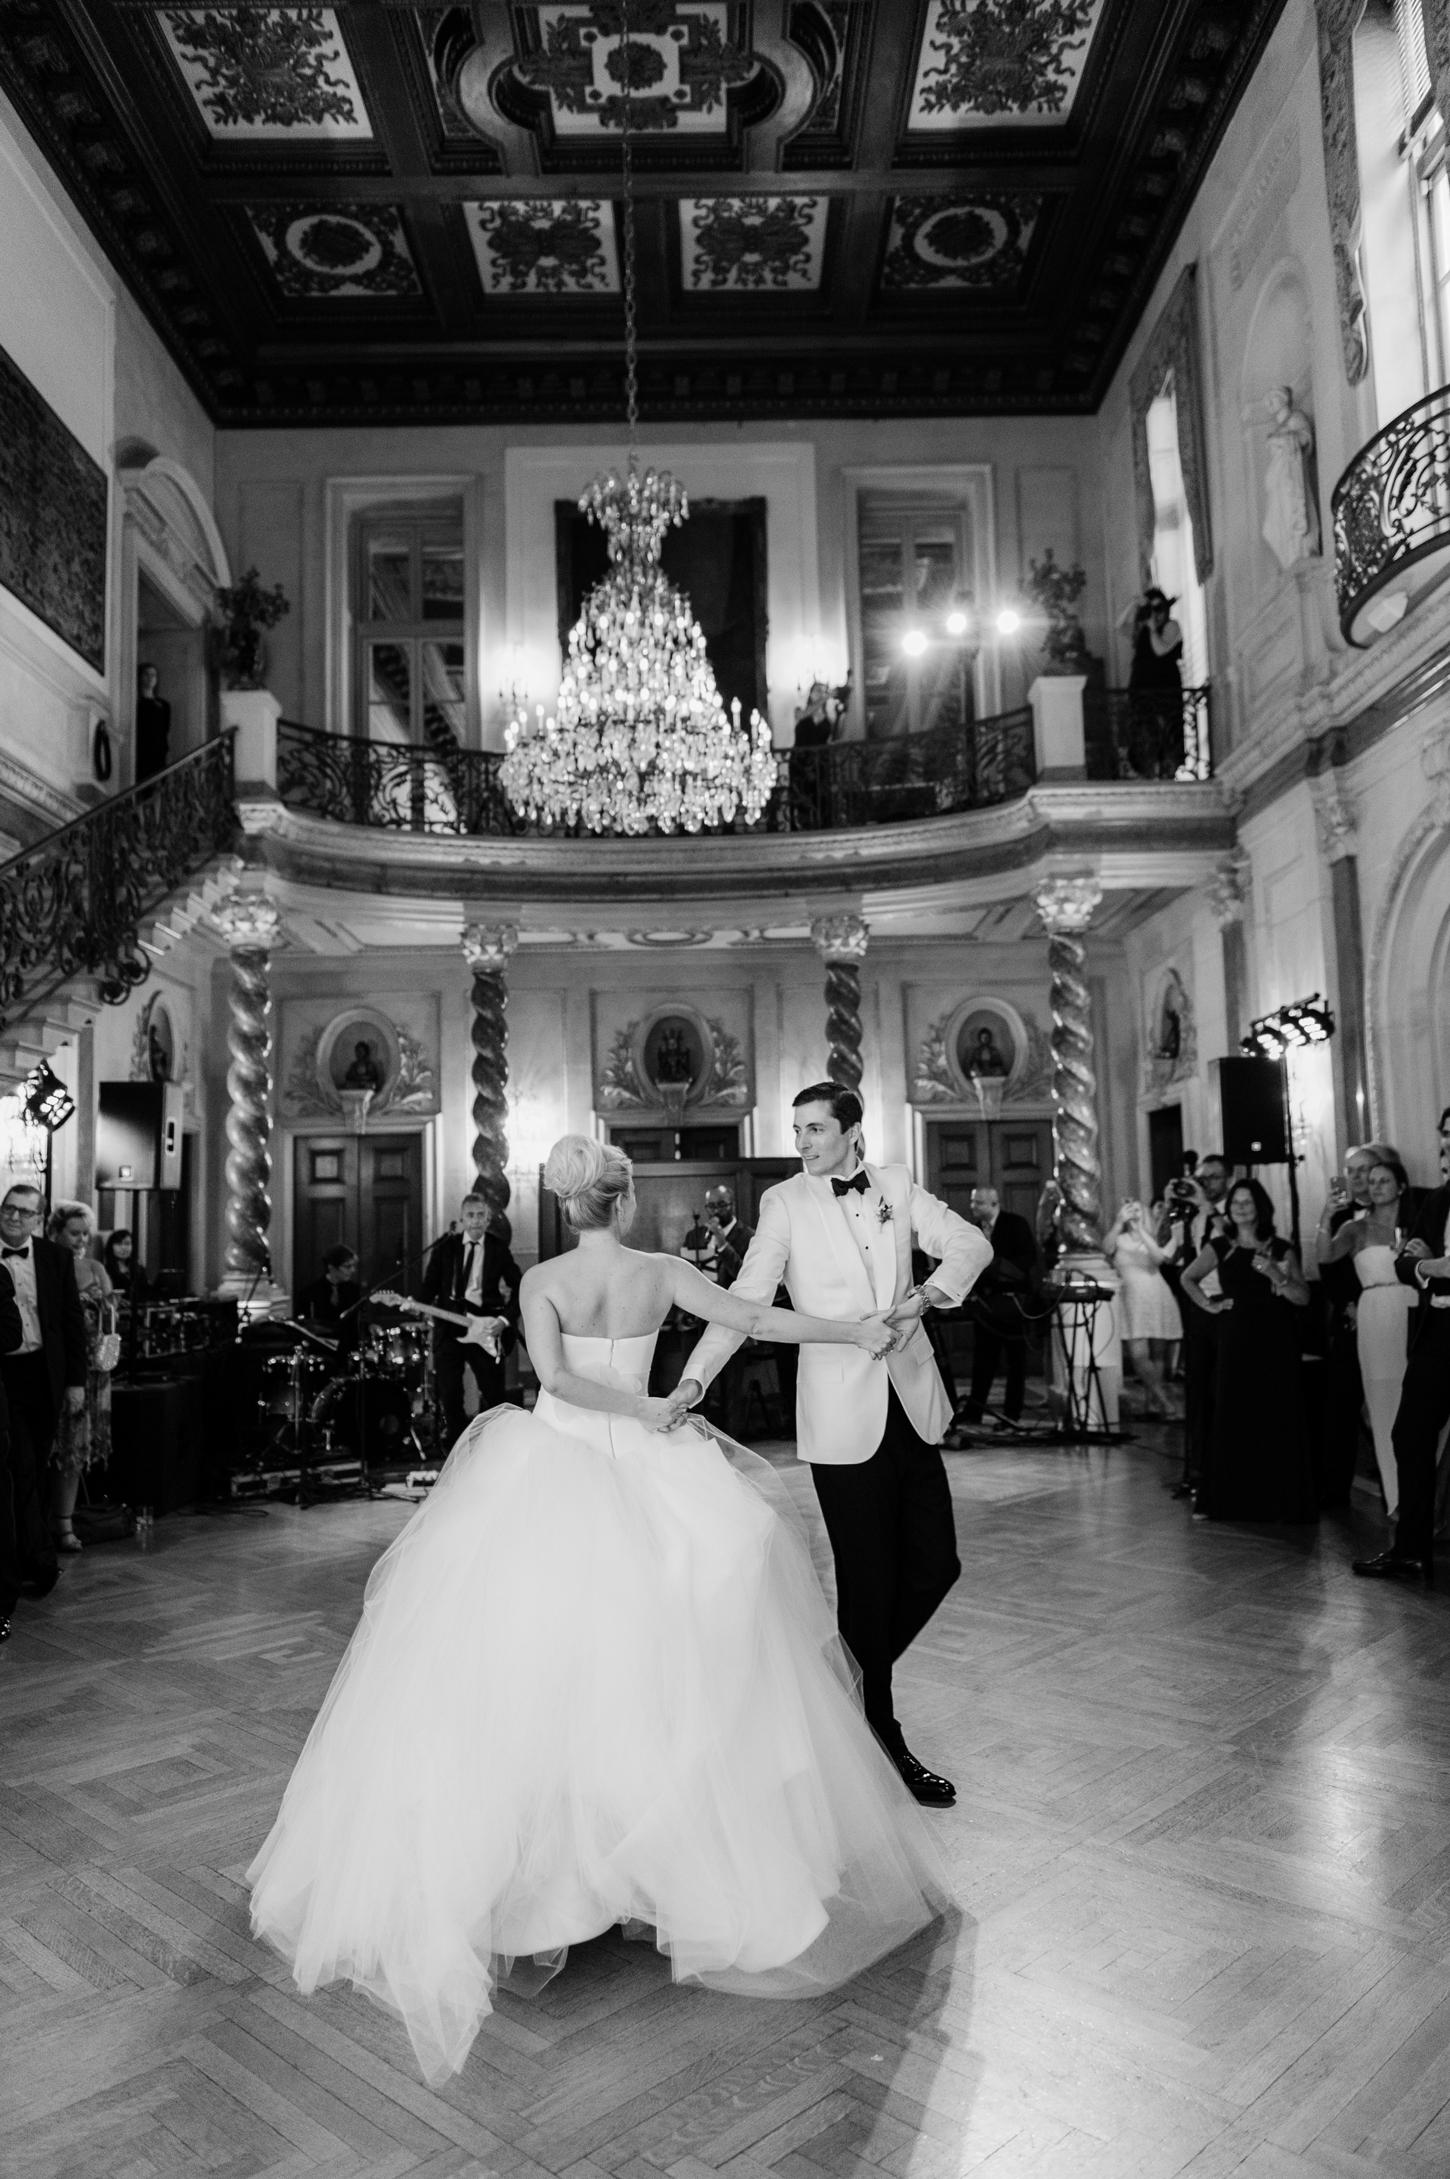 bride and groom first dance wedding reception venue